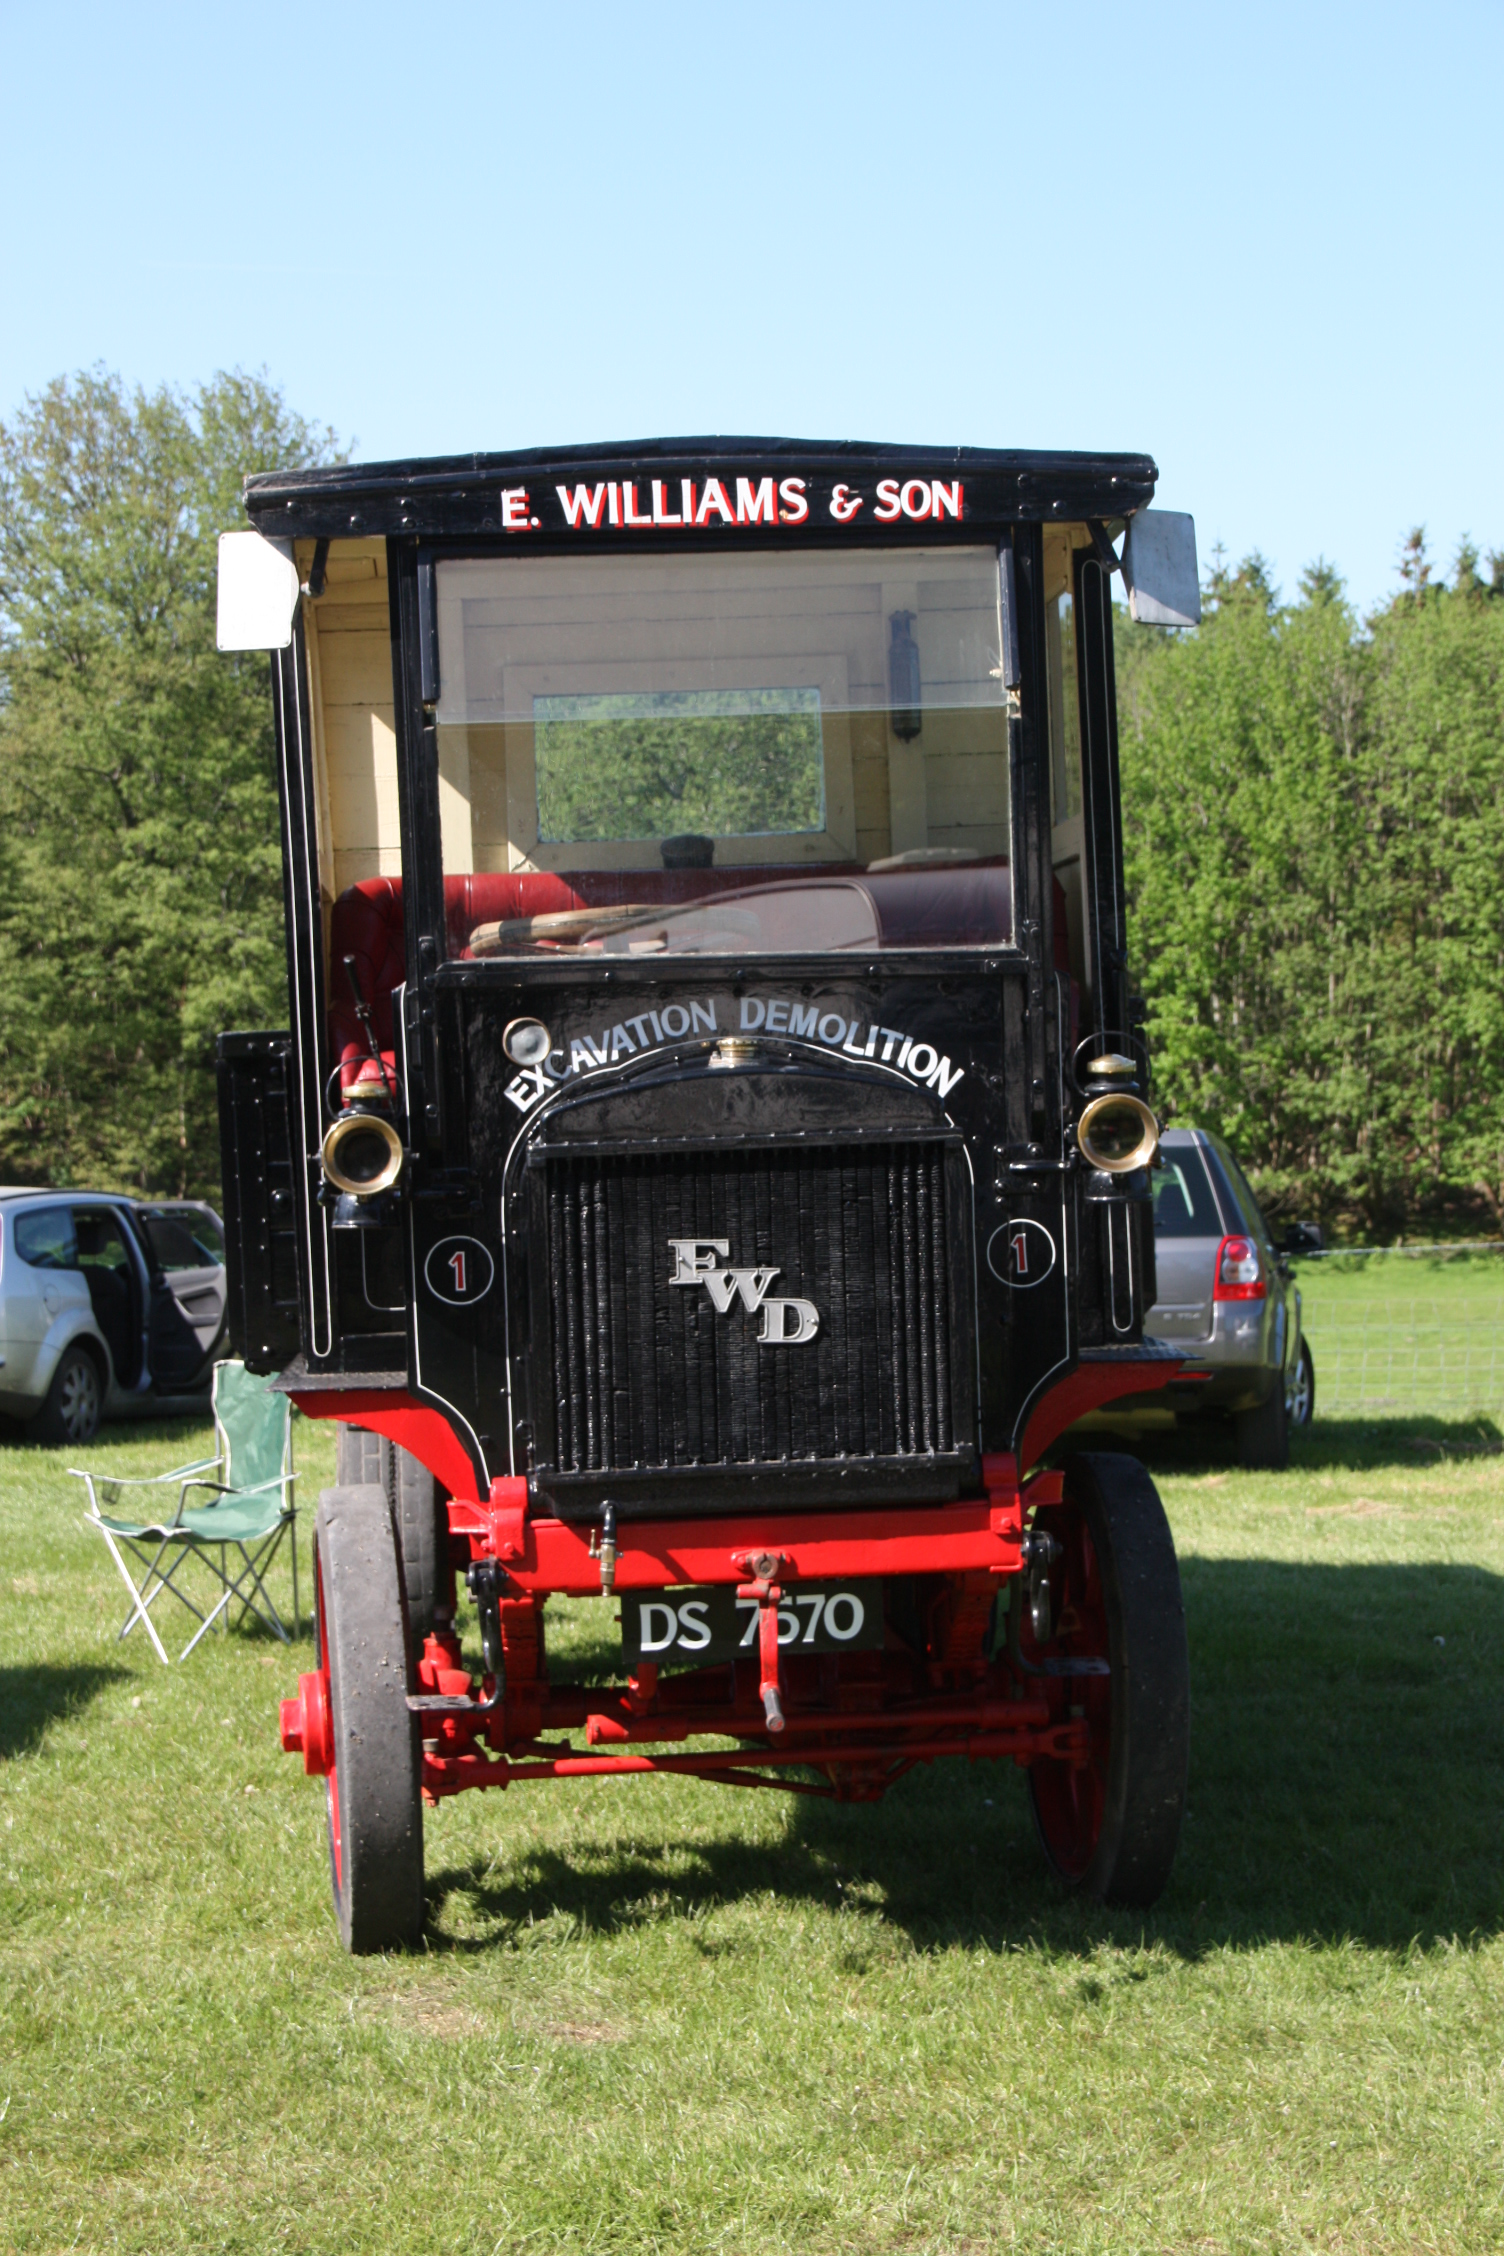 Fwd Auto Co - Tractor  U0026 Construction Plant Wiki